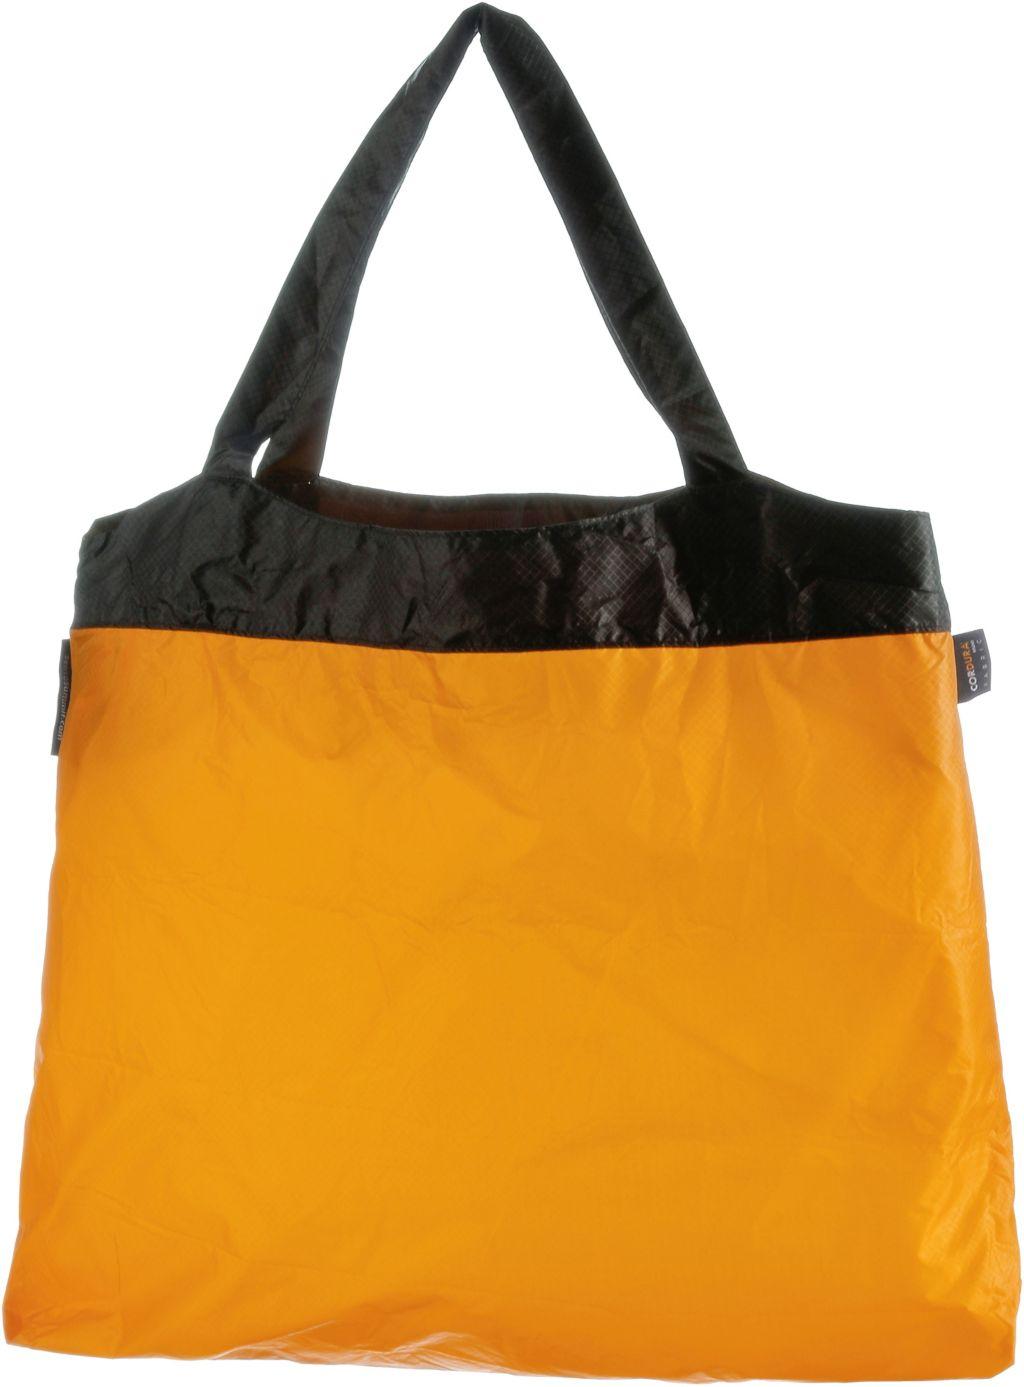 Sea to Summit Shopping Bag Umhängetasche